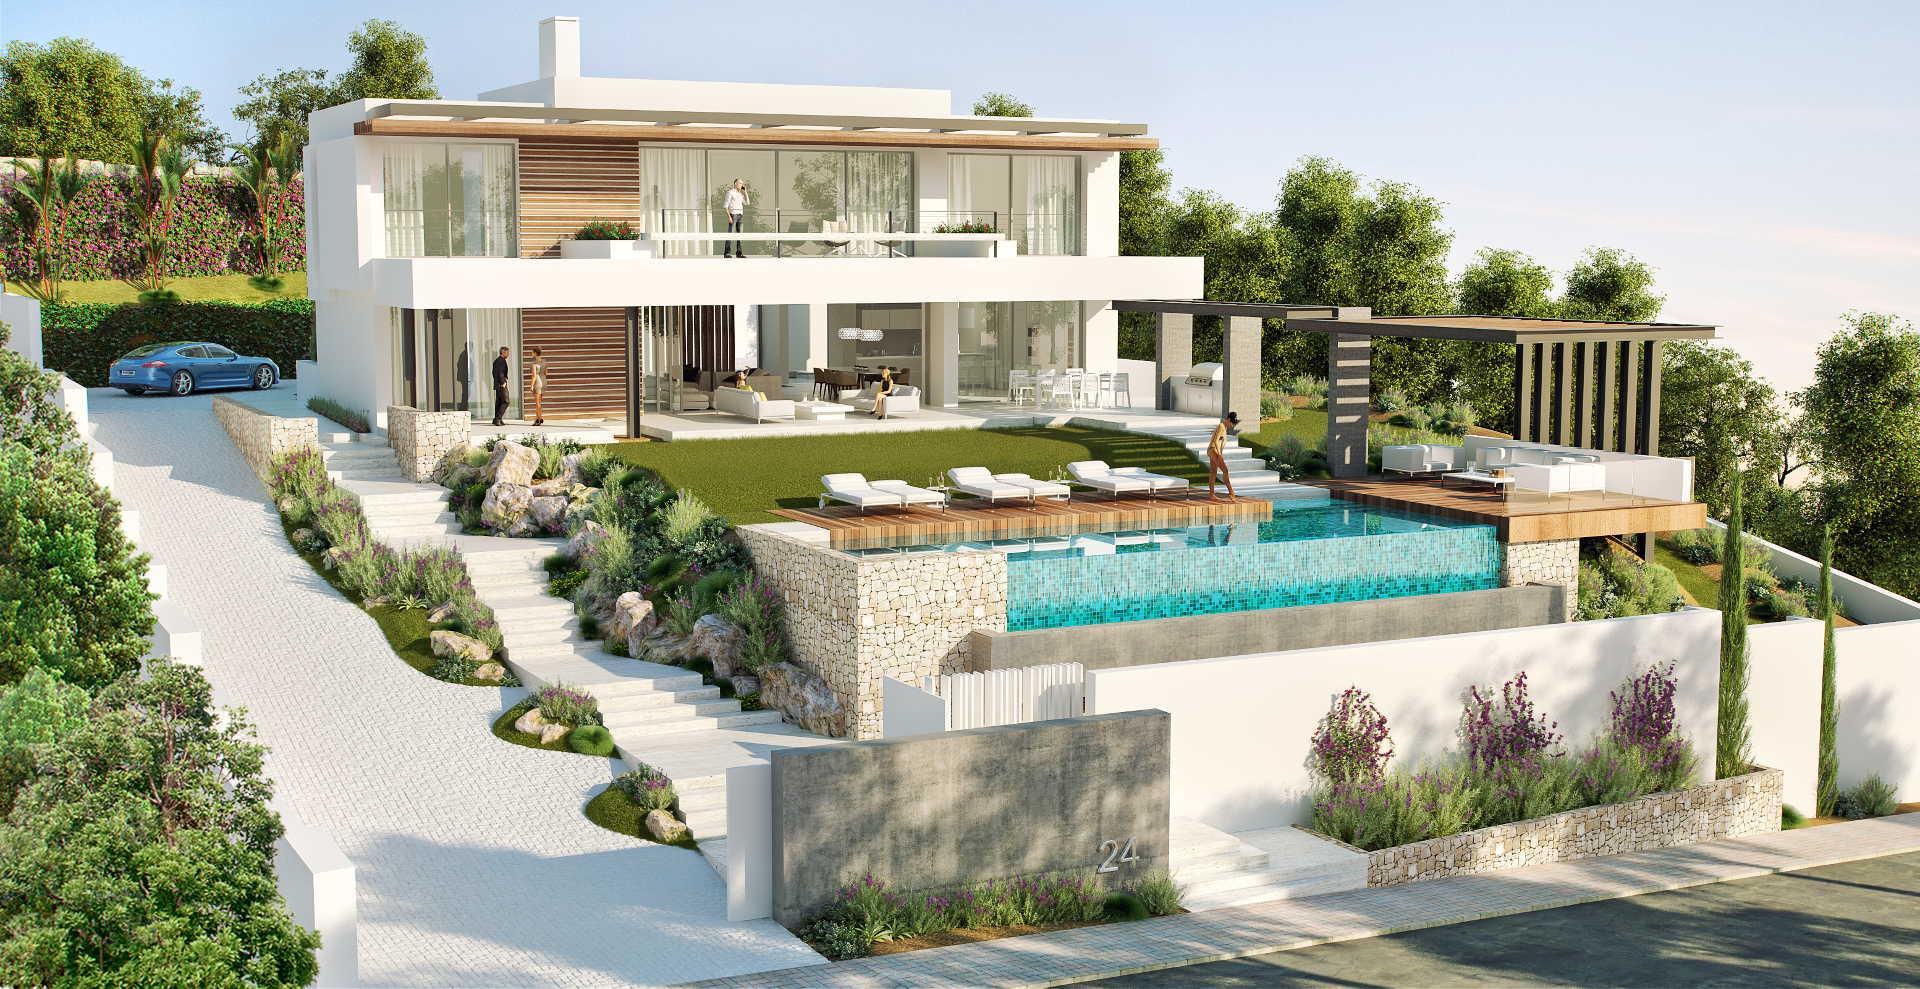 Nieuwbouw villa te koop La Alqueria Atalaya Benahavis